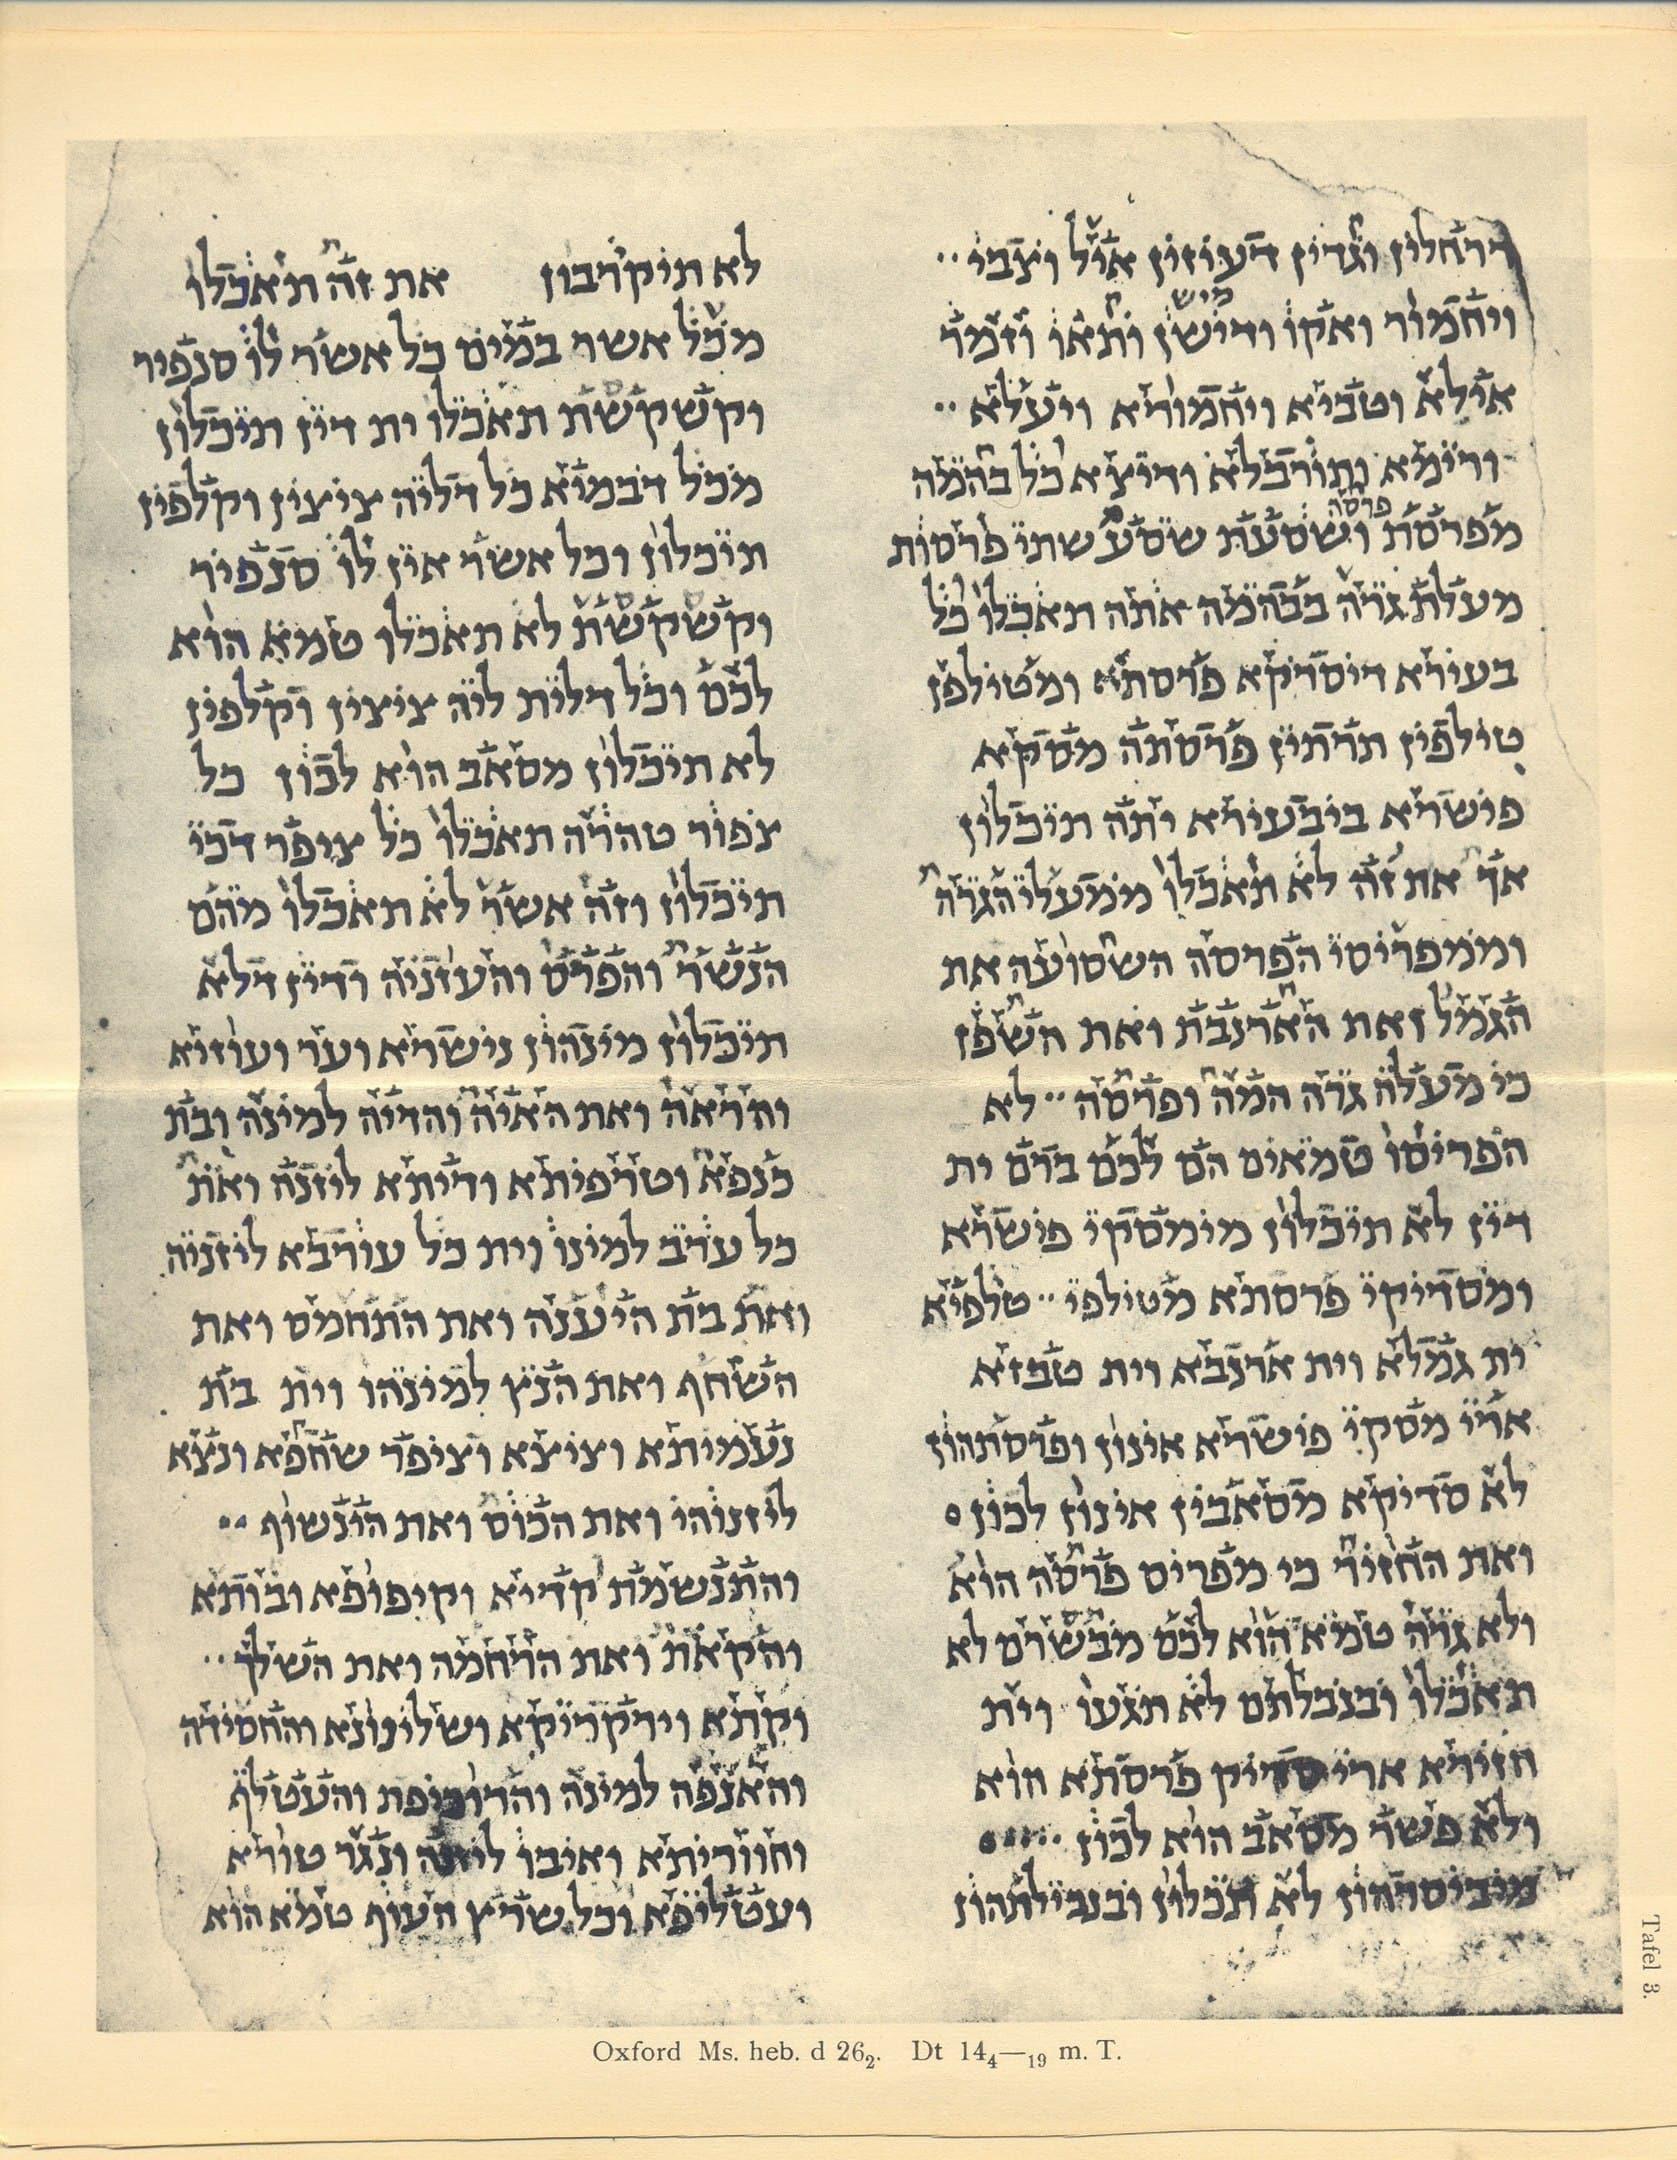 Hebrew manuscript with babylonian vocalization, 1913, Paul Kahle, Masoreten des Ostens, Leipzig 1913, plate 3.